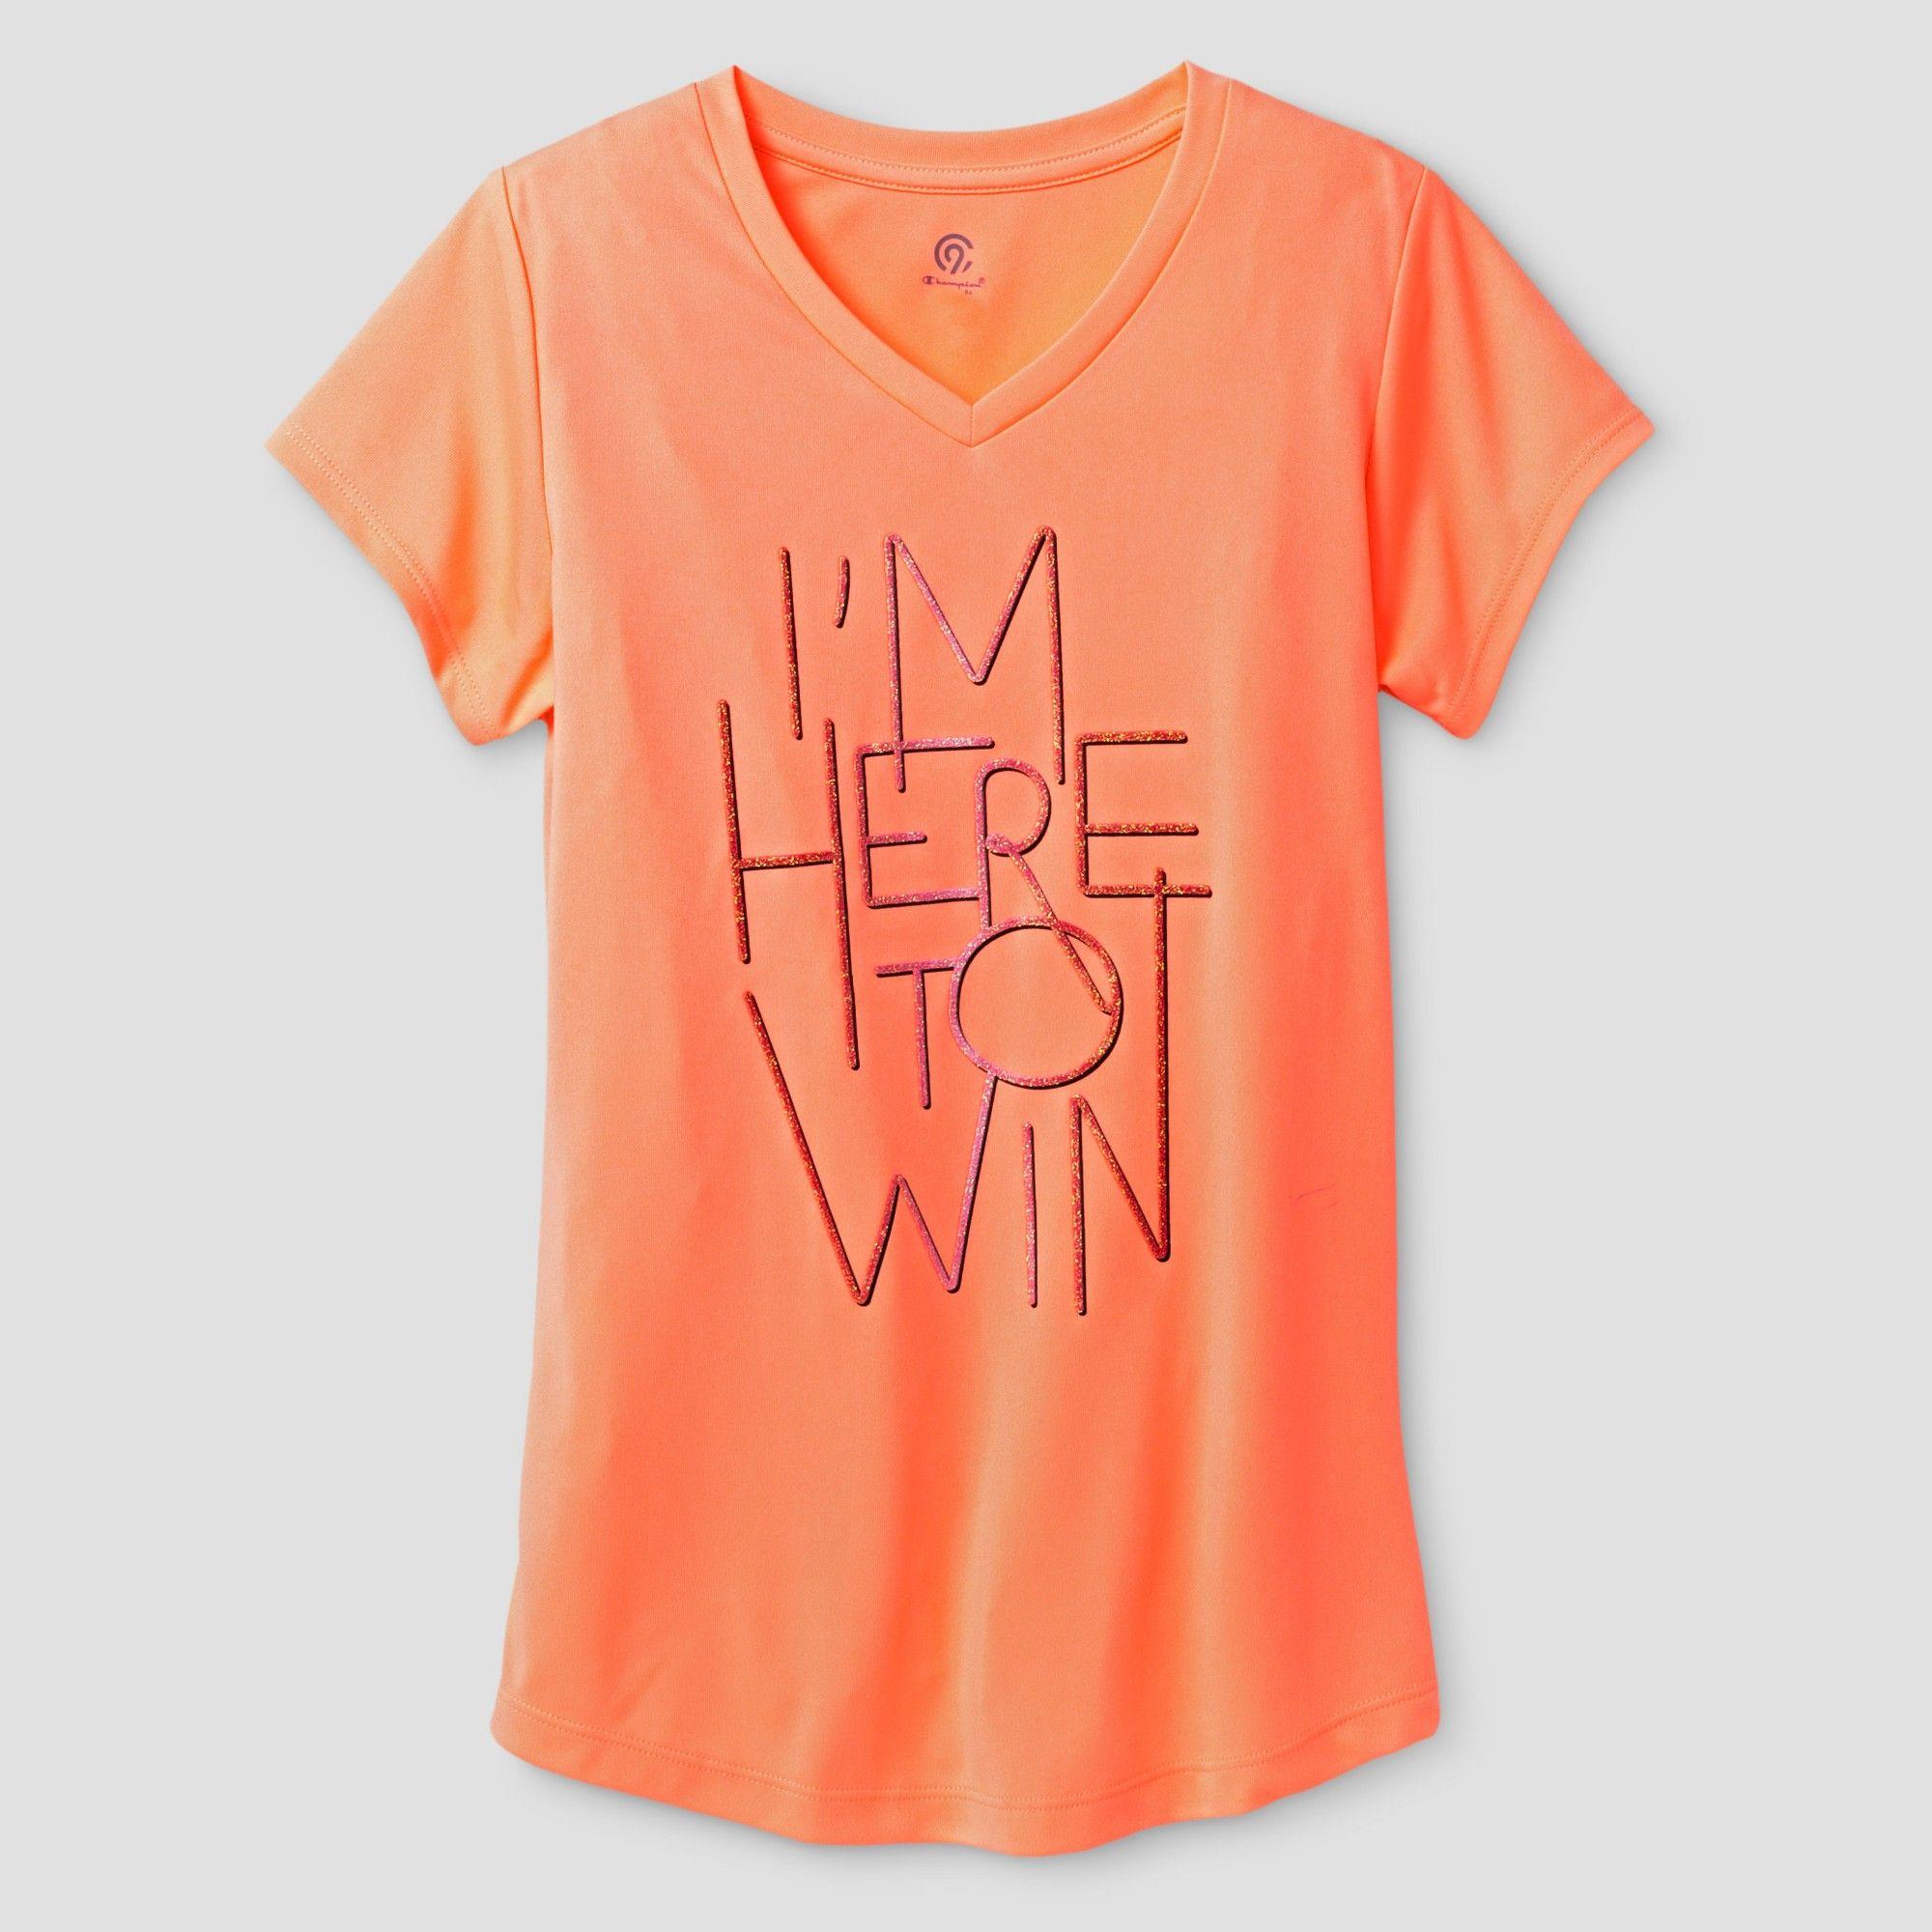 0c4abf62 Girls' Graphic Tech T-Shirt - C9 Champion Light Coral XS, Pink ...